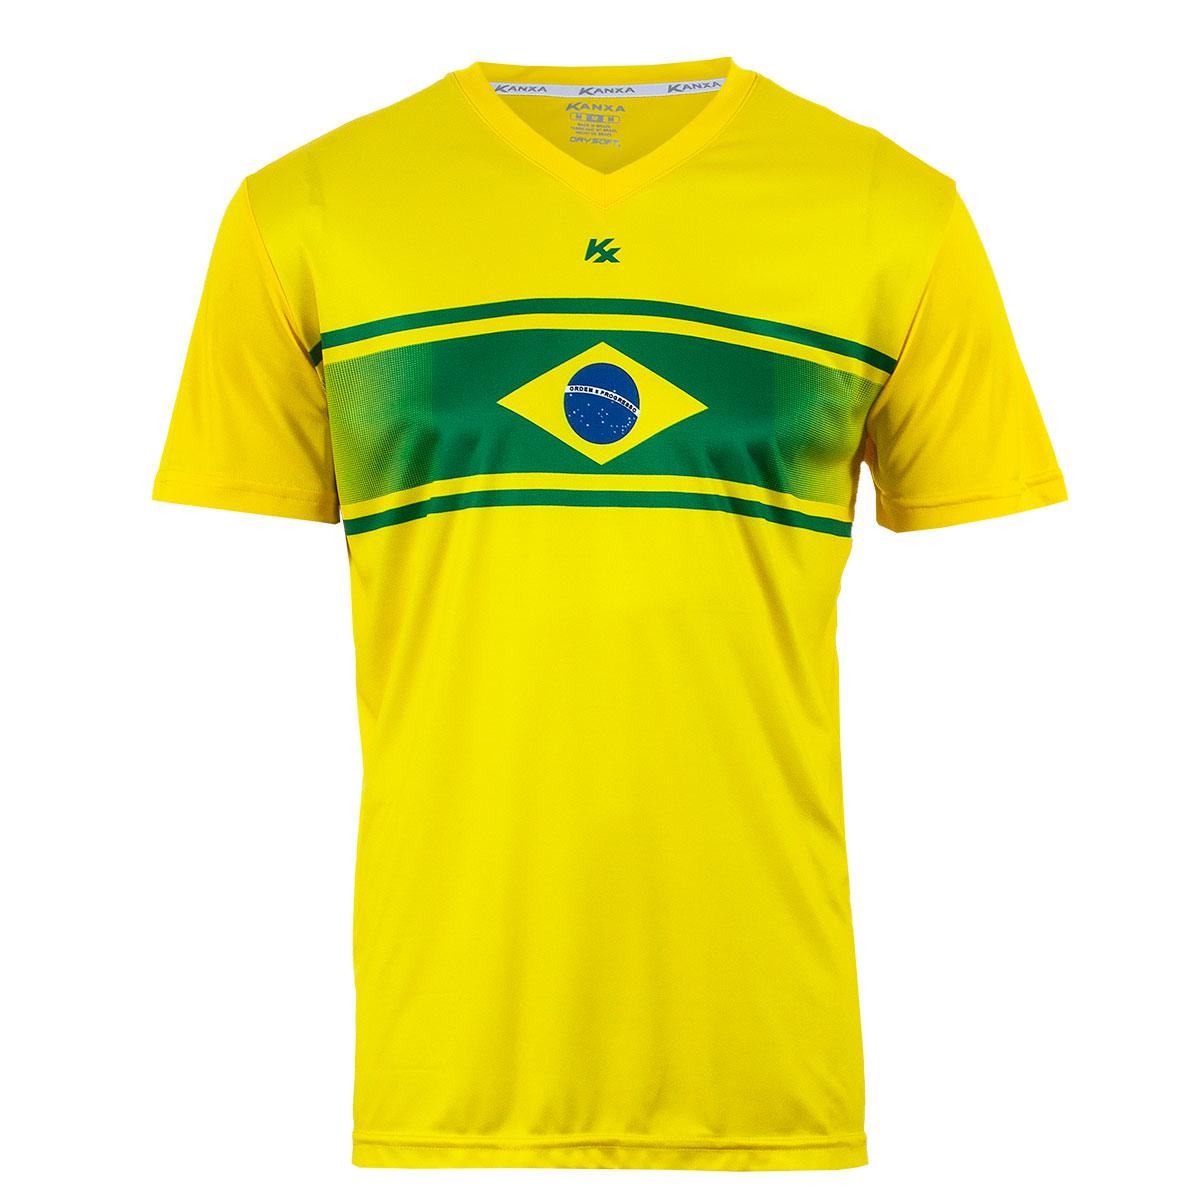 Camiseta Masc. Kanxa Gol Braza Casual - Amarelo/Verde